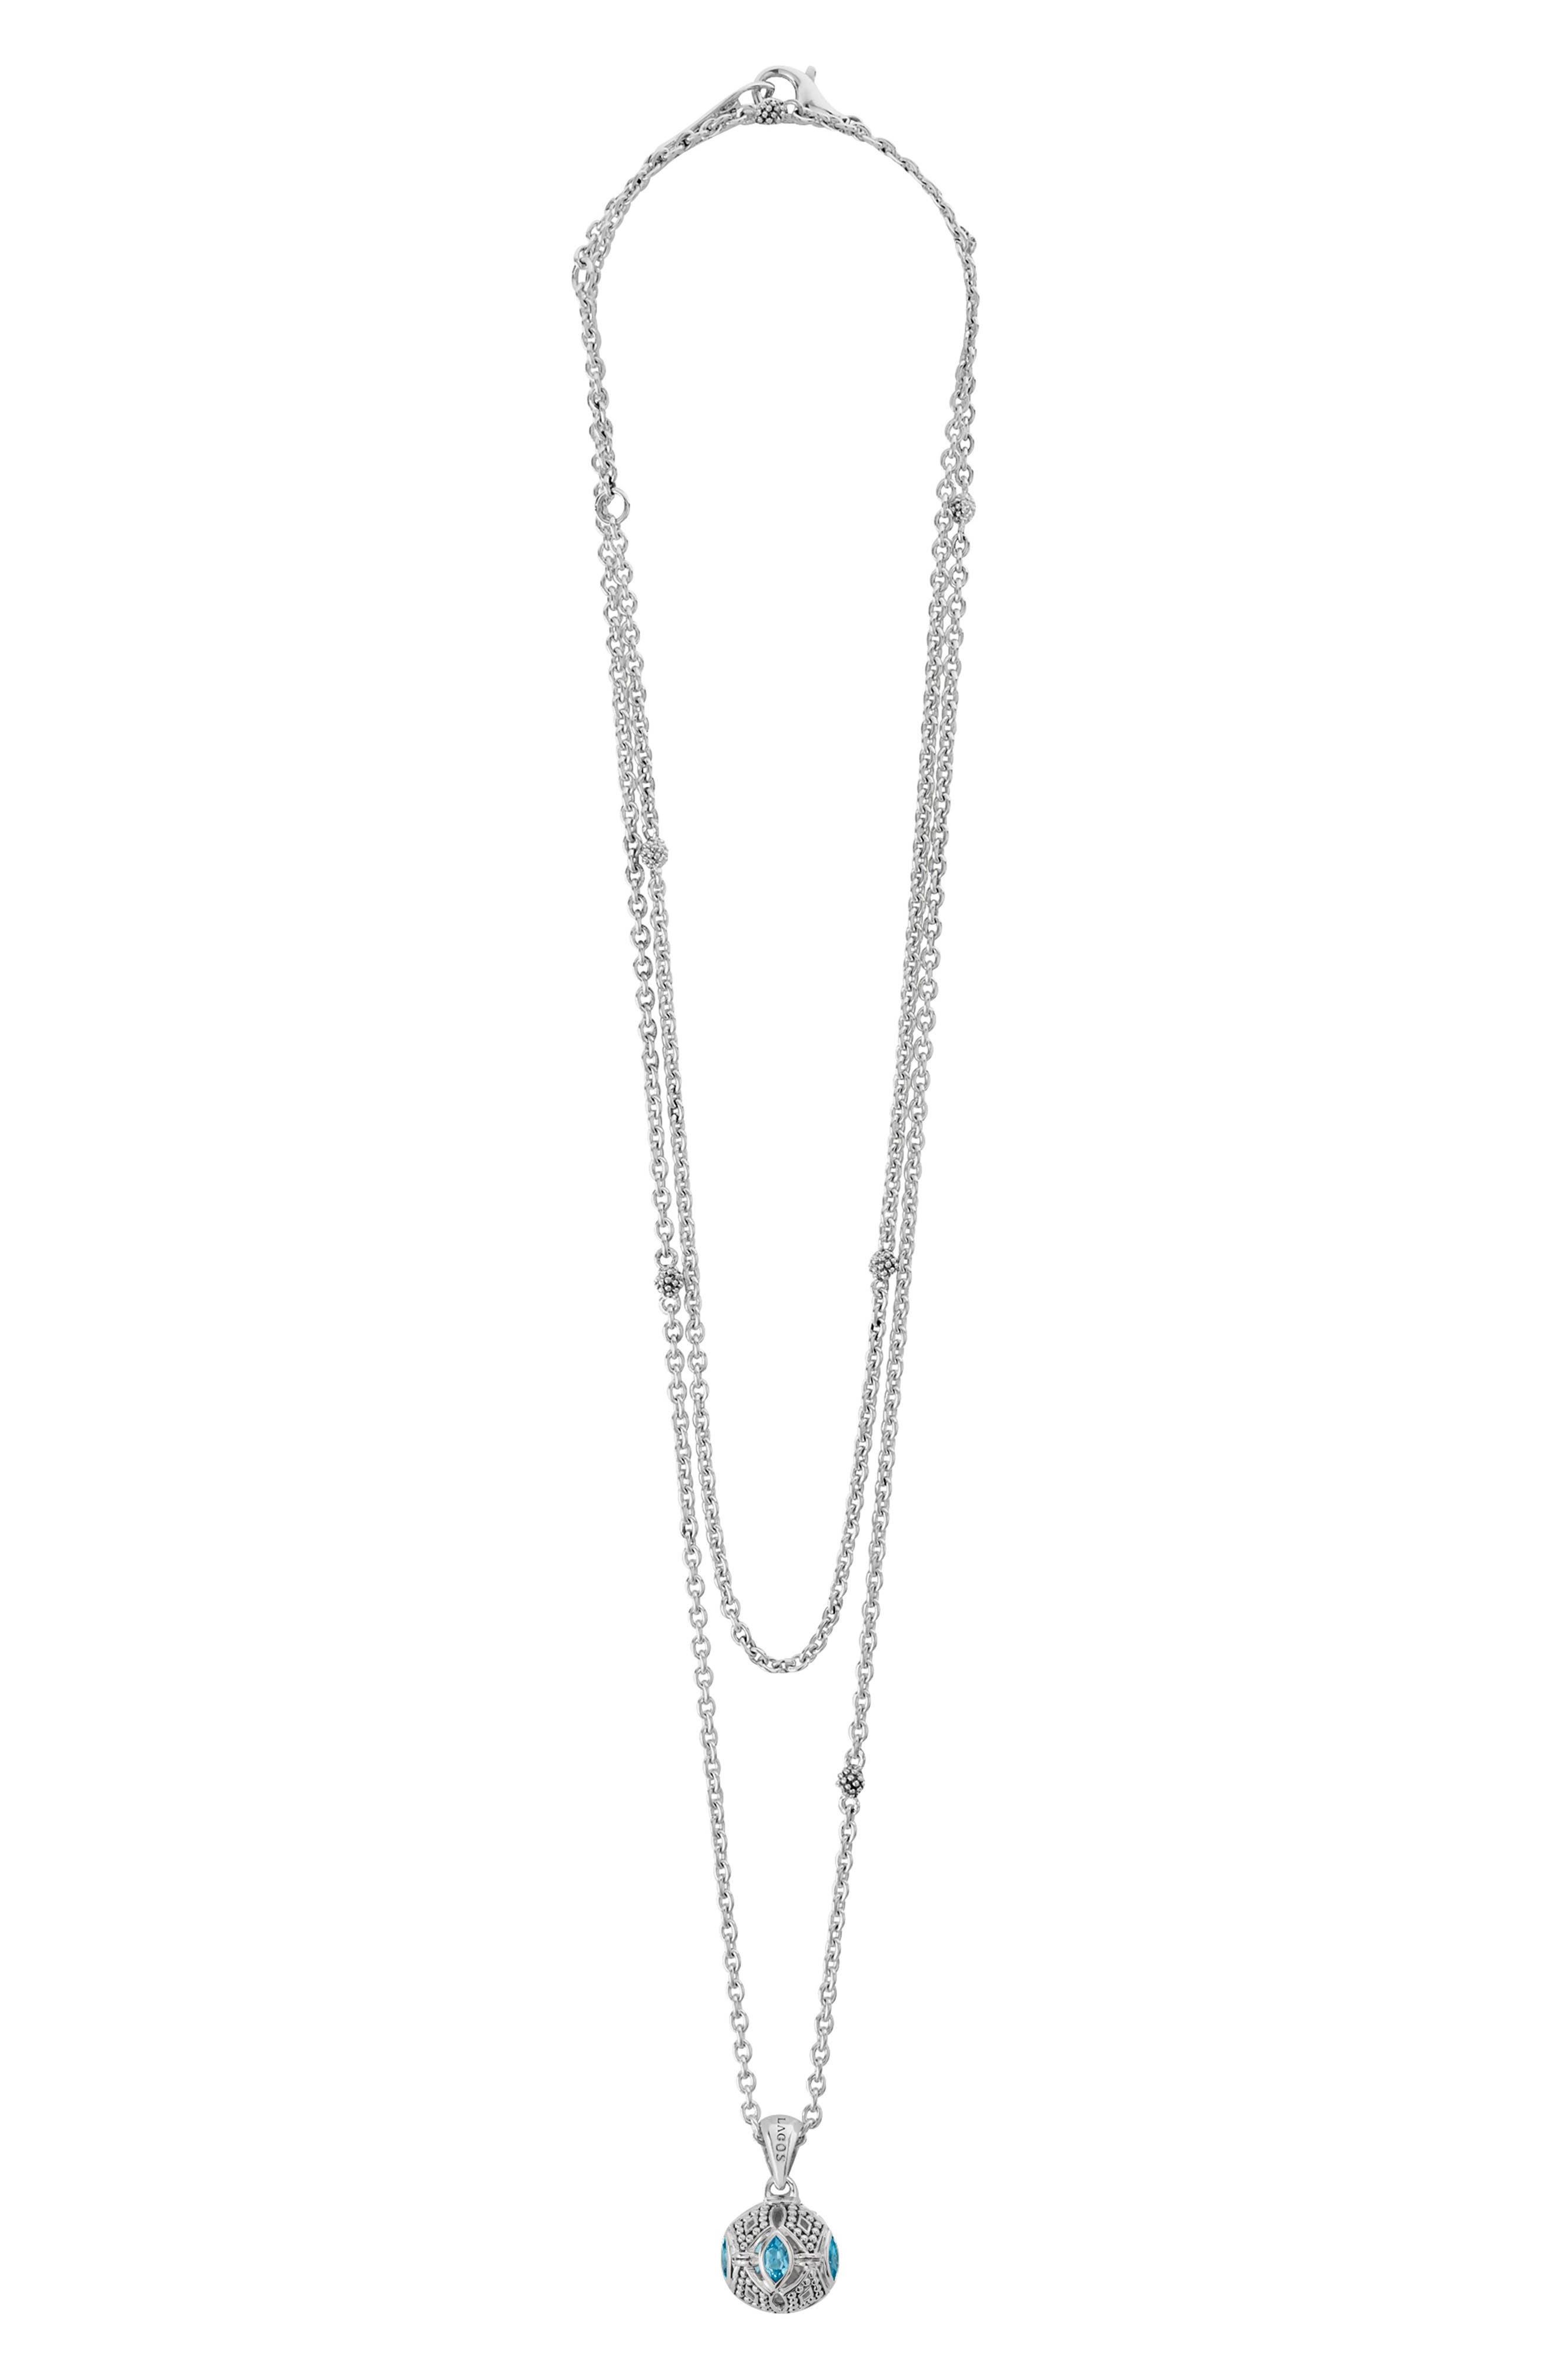 Caviar Talisman Marquee Ball Link Necklace,                             Main thumbnail 1, color,                             Silver/ Blue Topaz